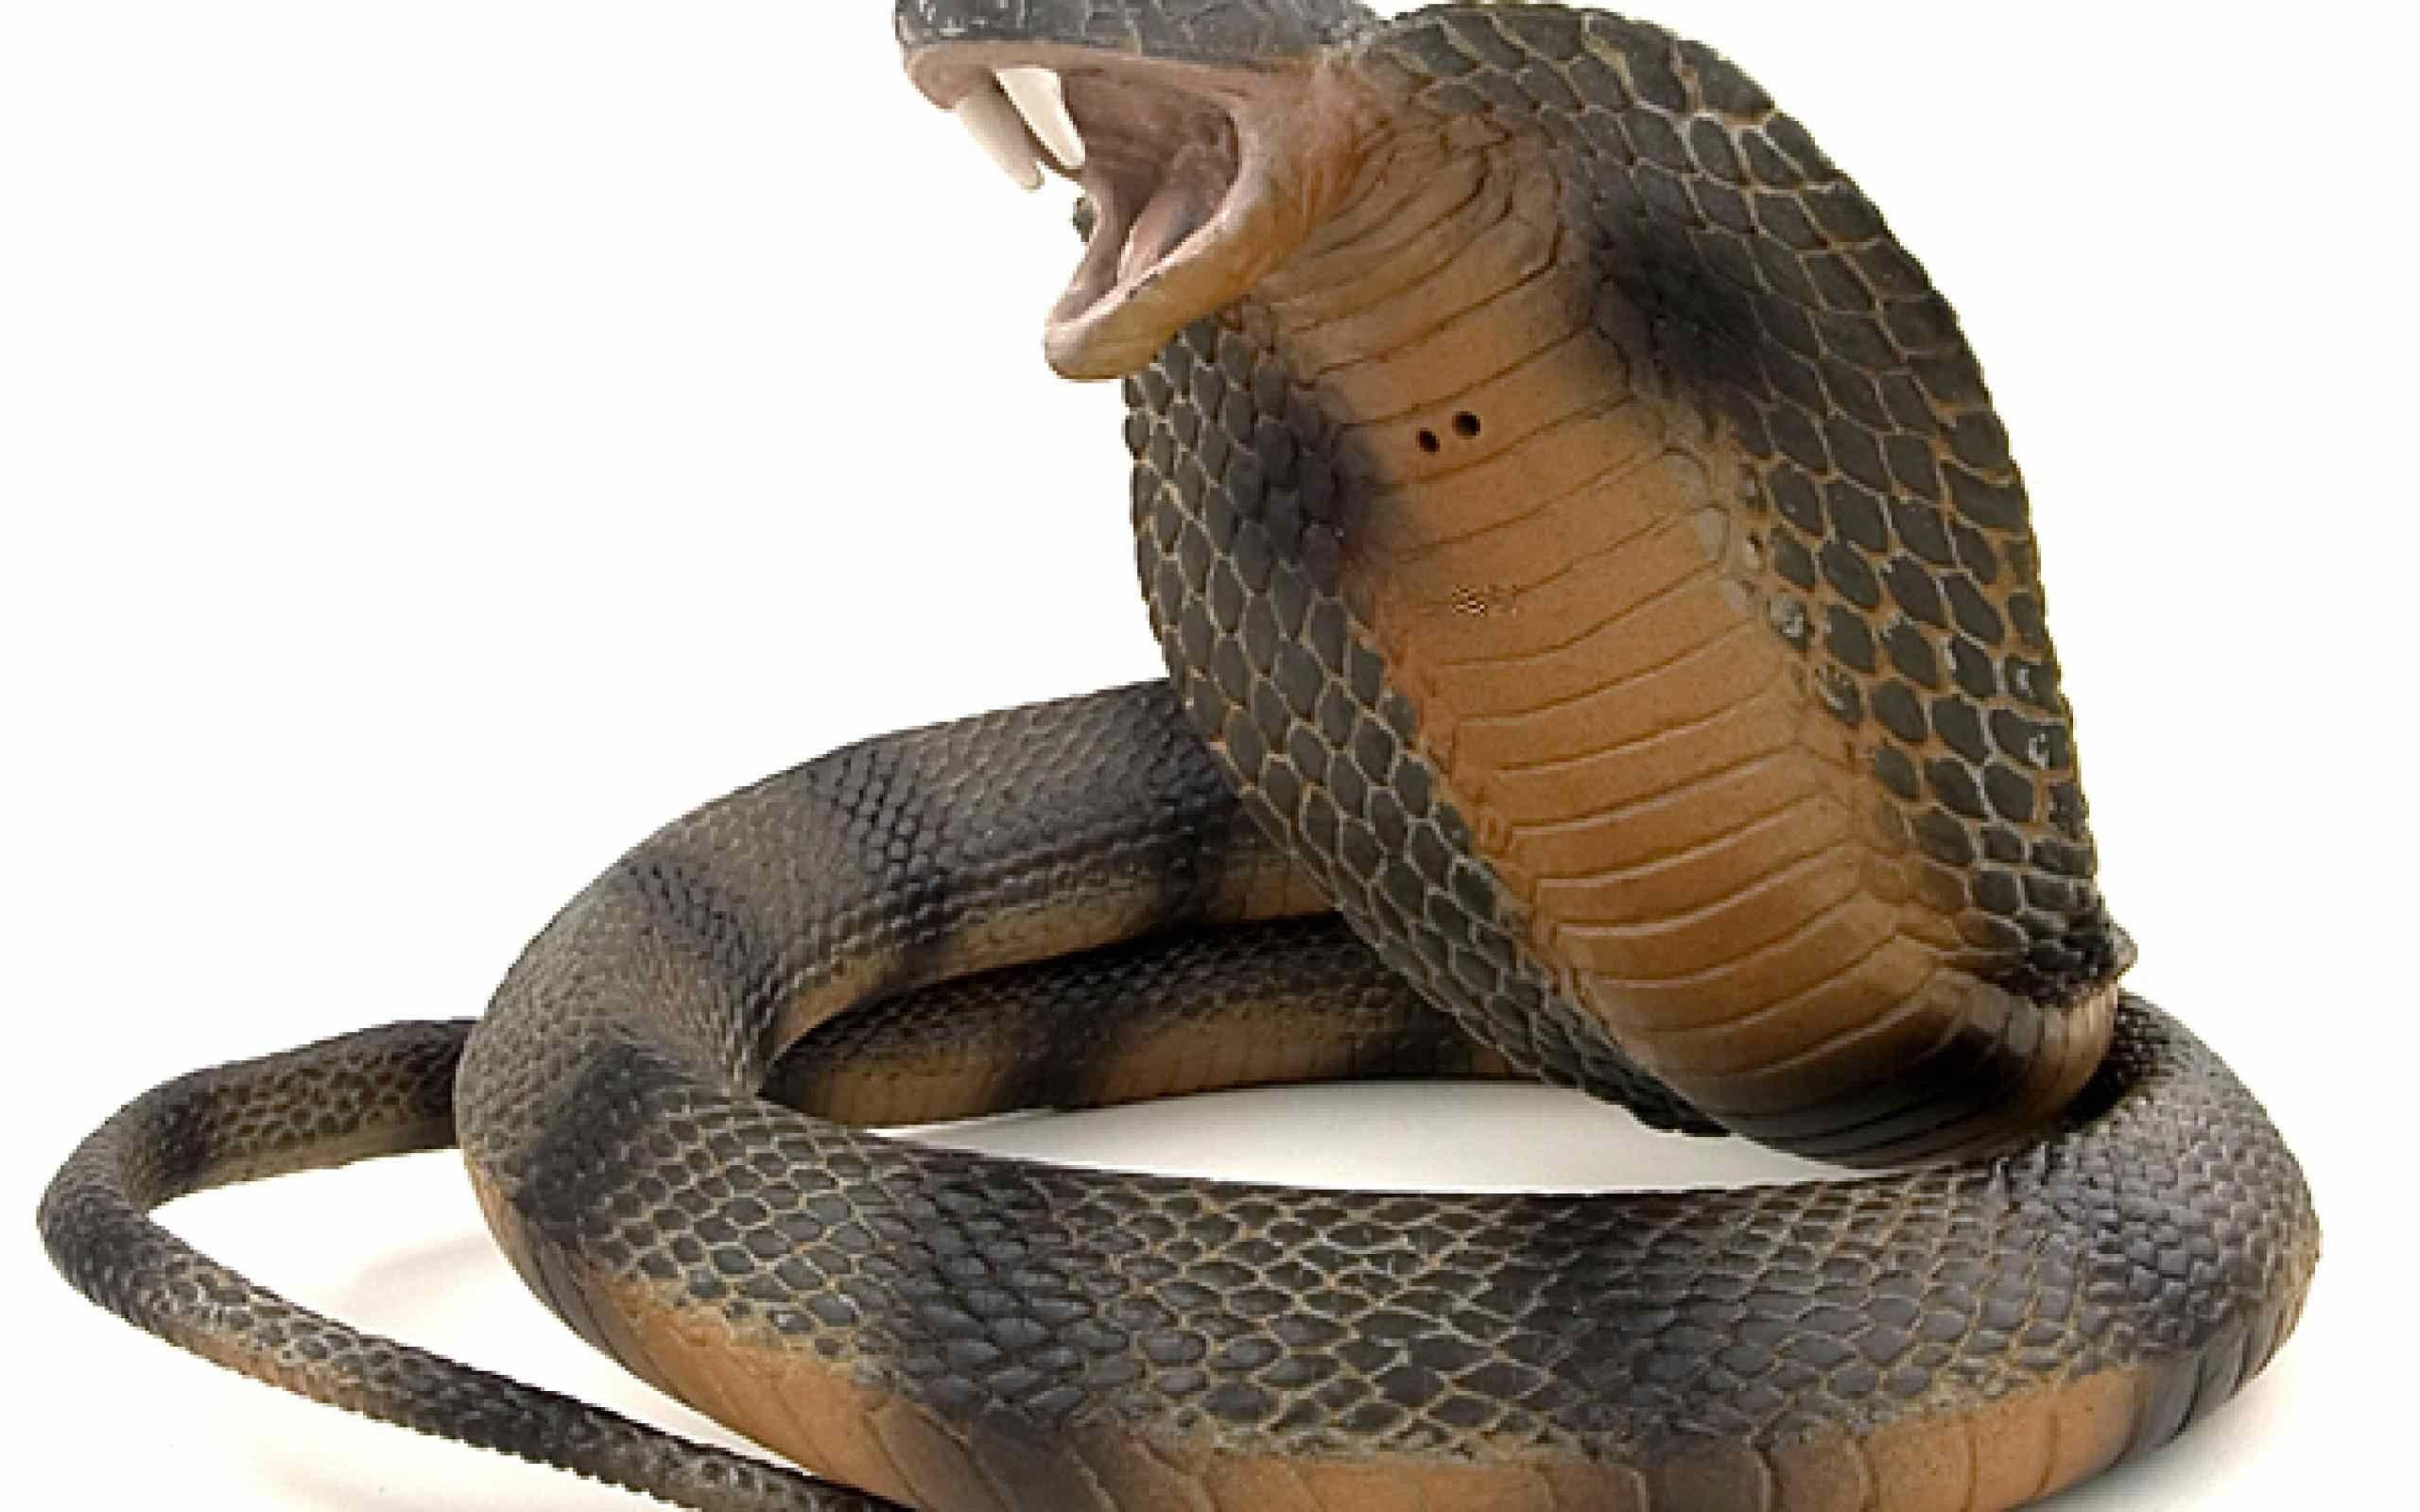 King Cobra Snake Wallpapers Hd Wallpaper Cave Images, Photos, Reviews